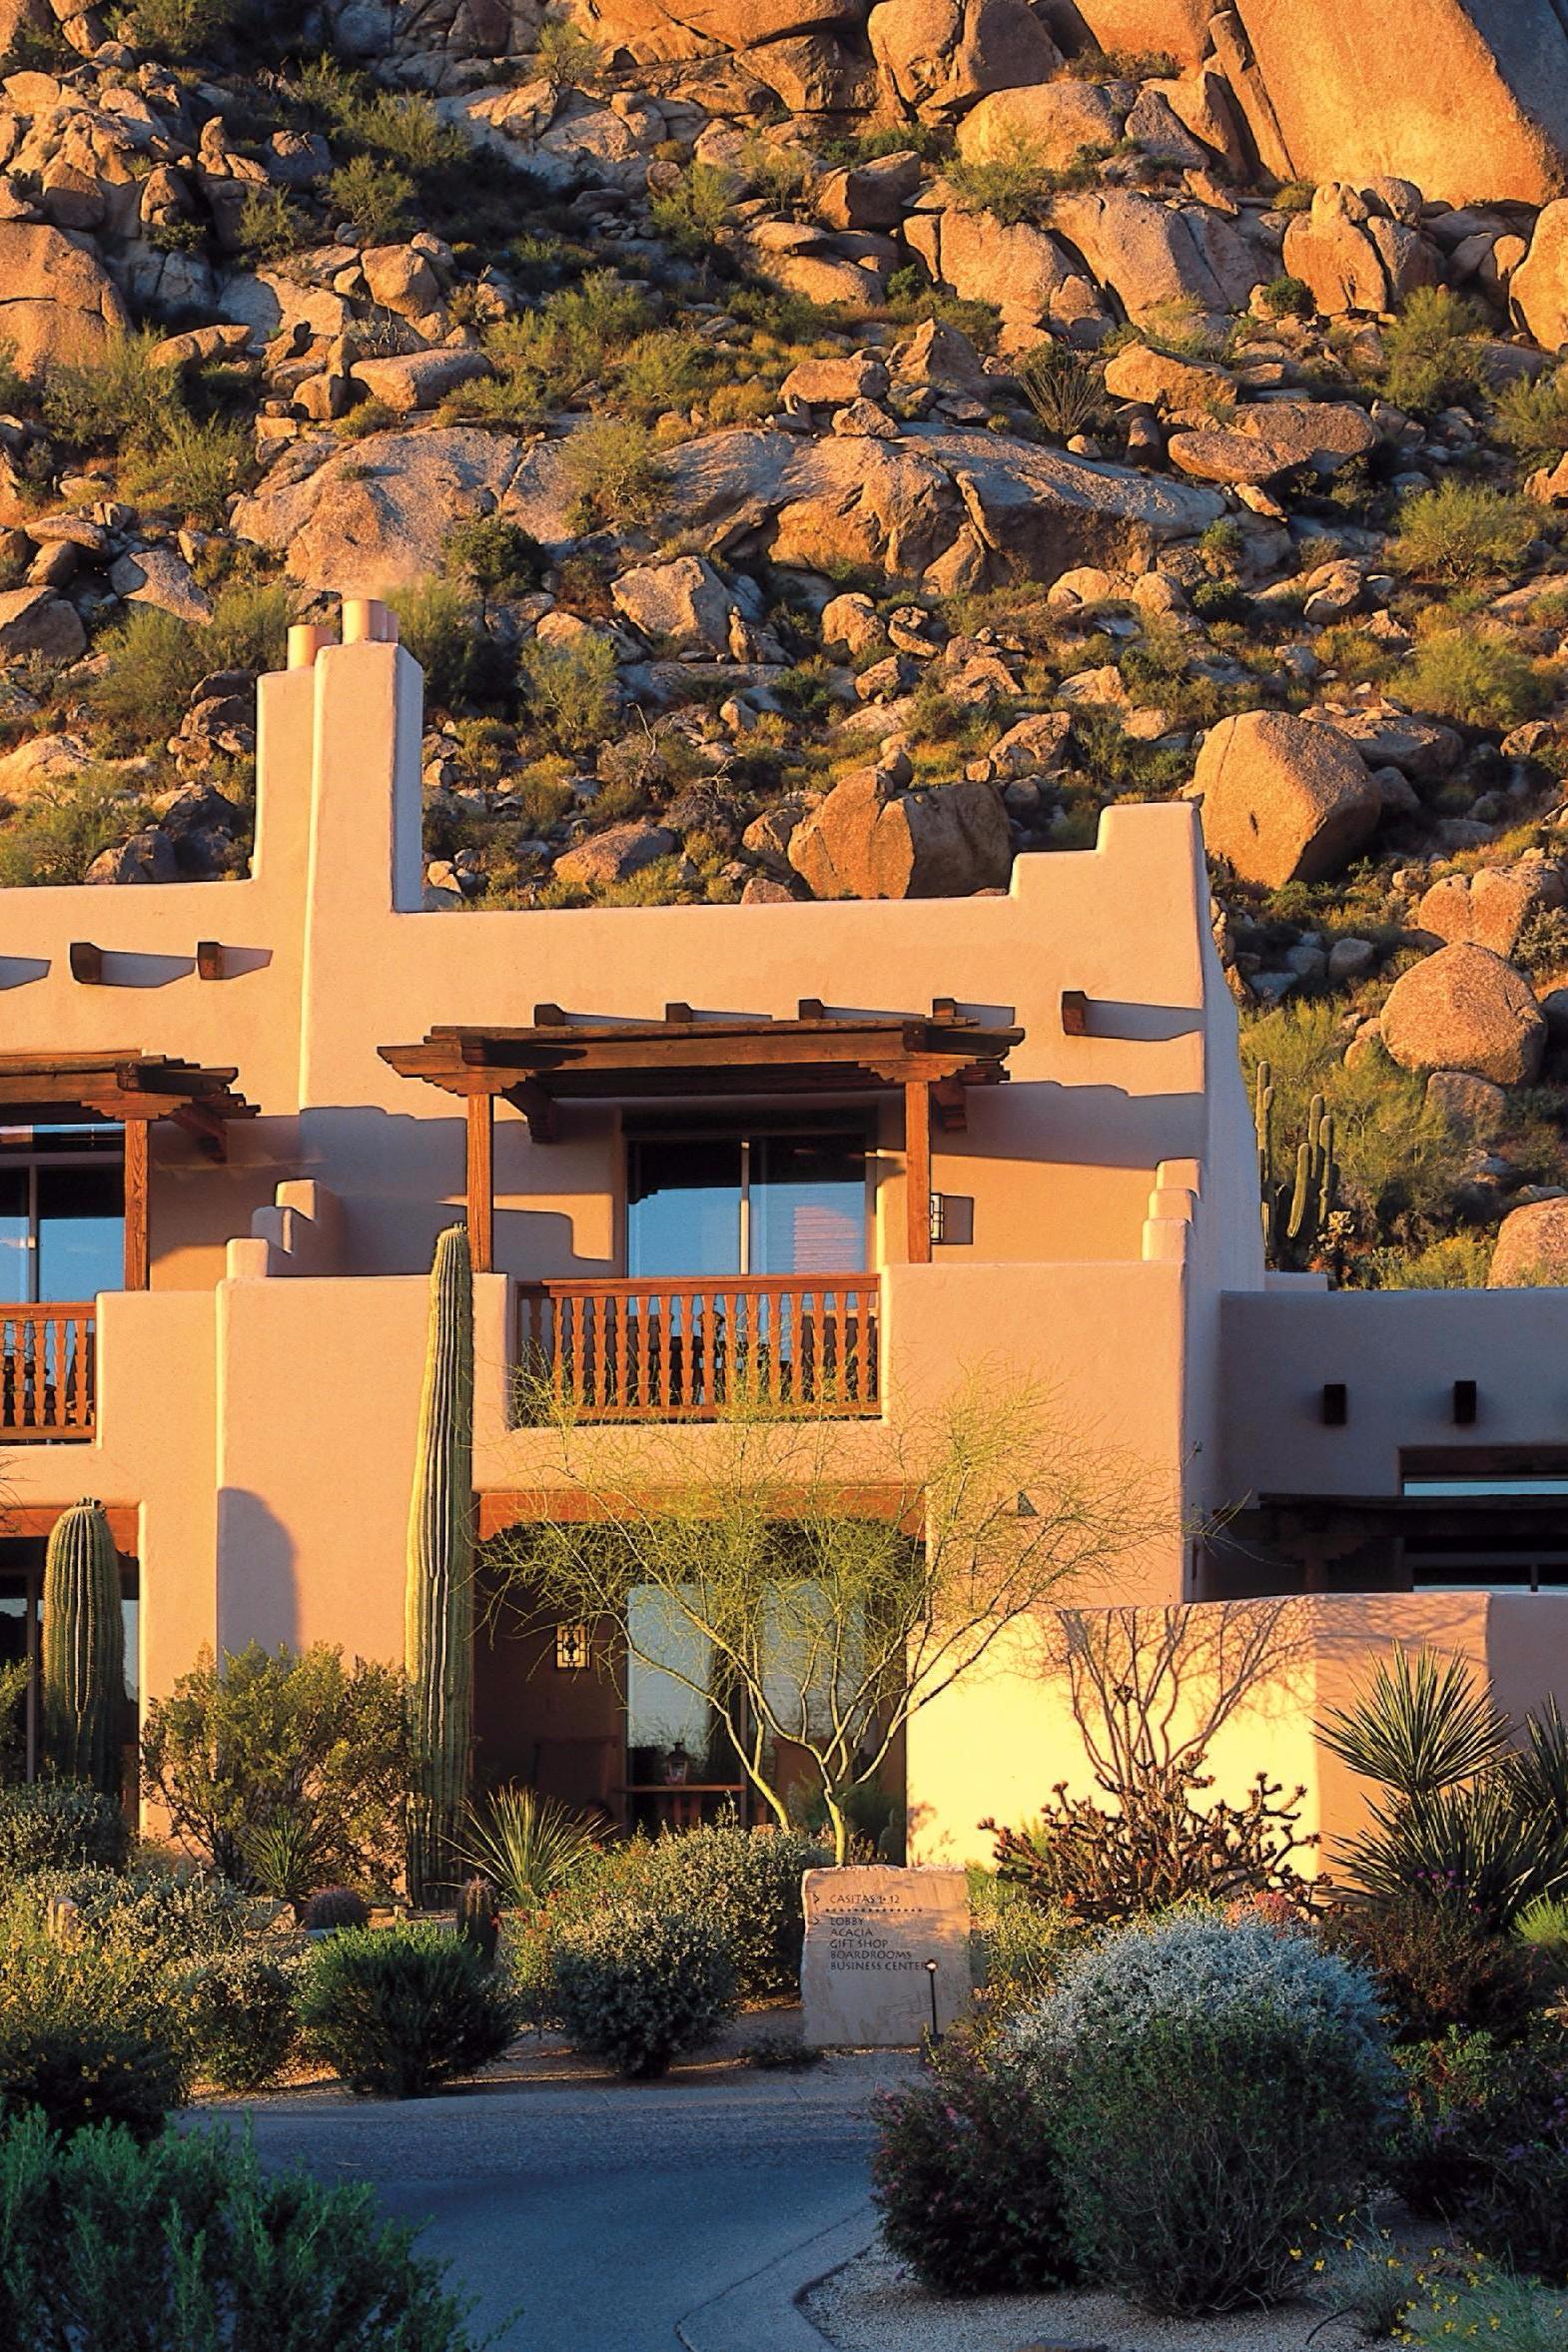 Four Seasons Resort Scottsdale At Troon North Scottsdale Az Jetsetter Resort Arizona Holiday Resort